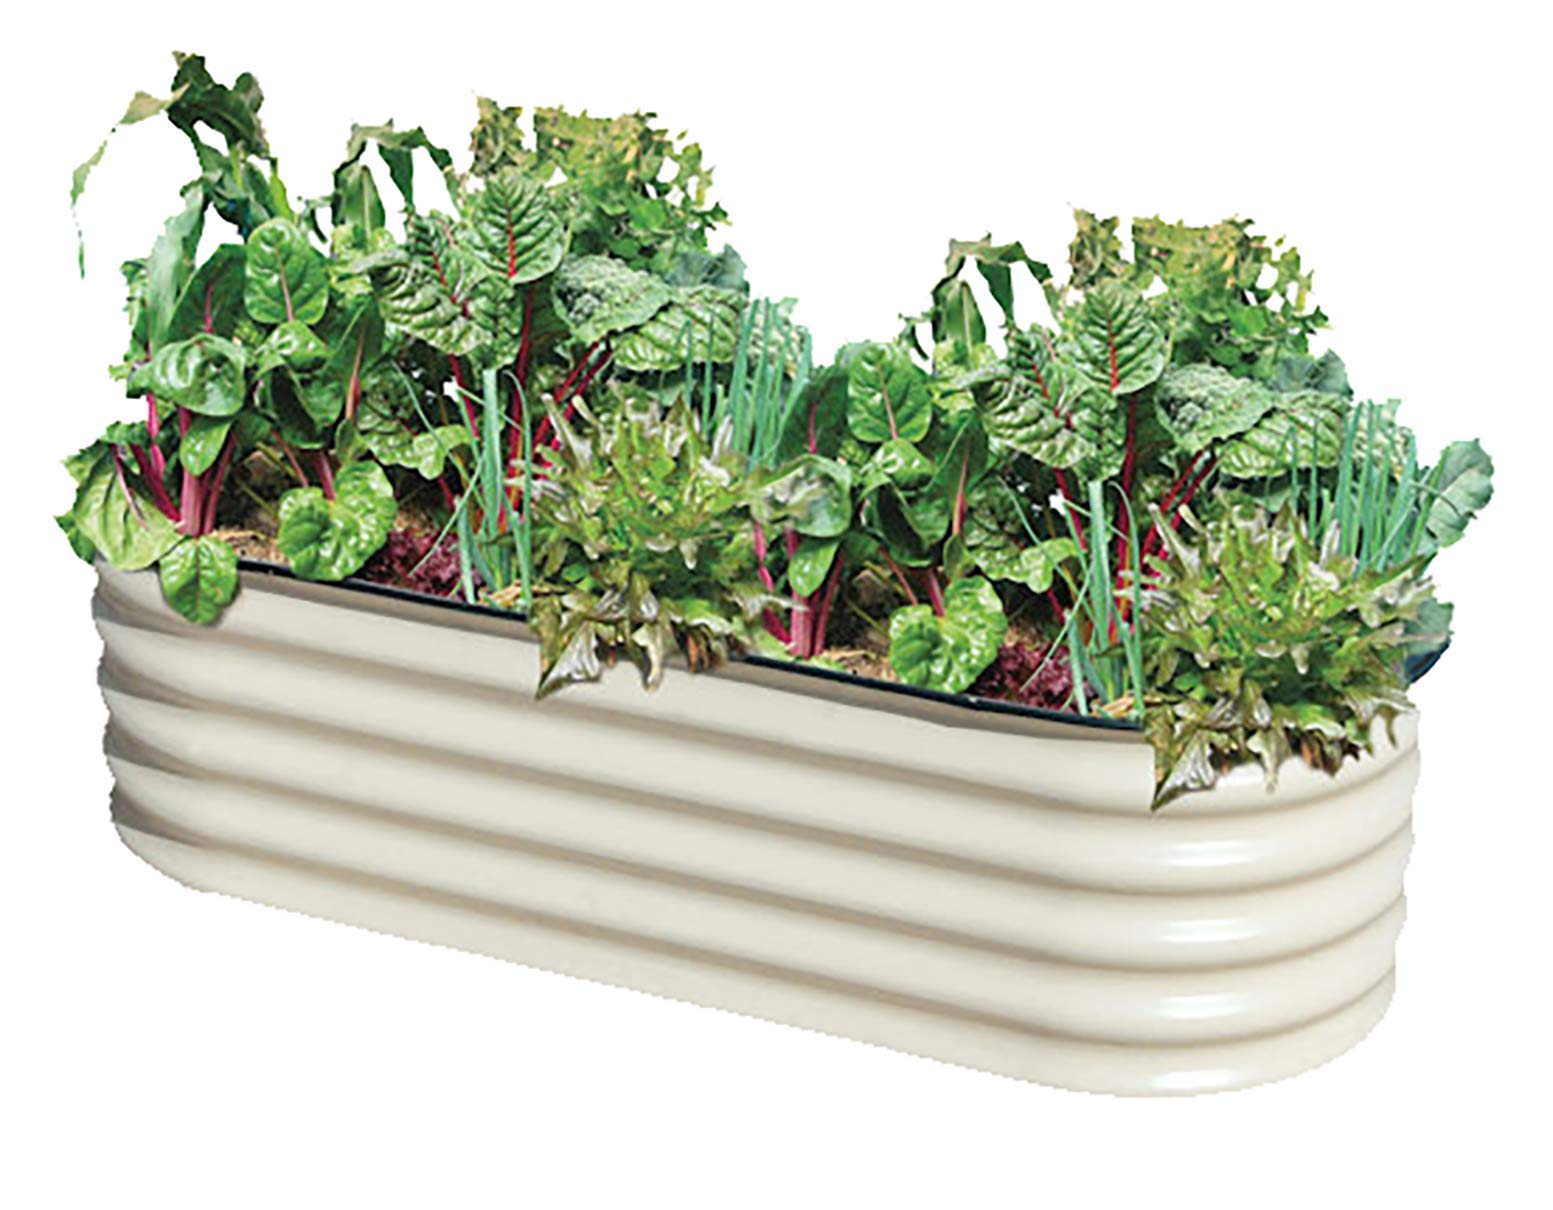 Metal Garden Bed, Jungle Jane's Raised Garden Box, 4 x 7 ft Outdoor Planter